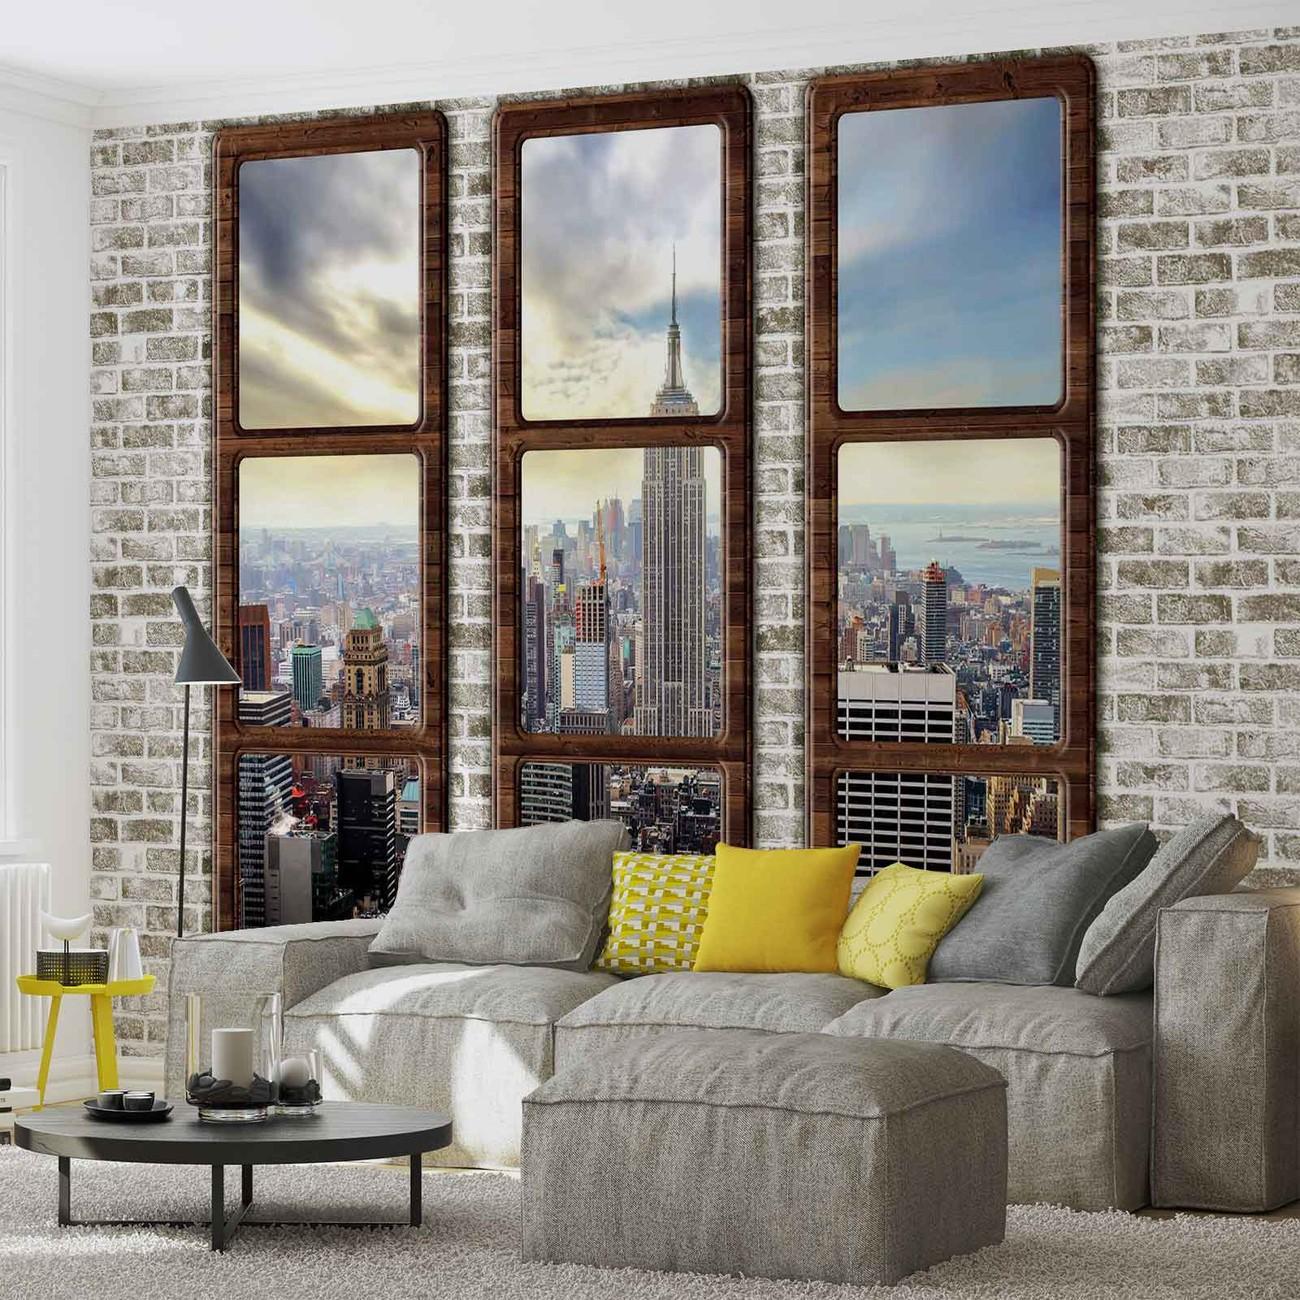 New York City Skyline Window View Wall Paper Mural